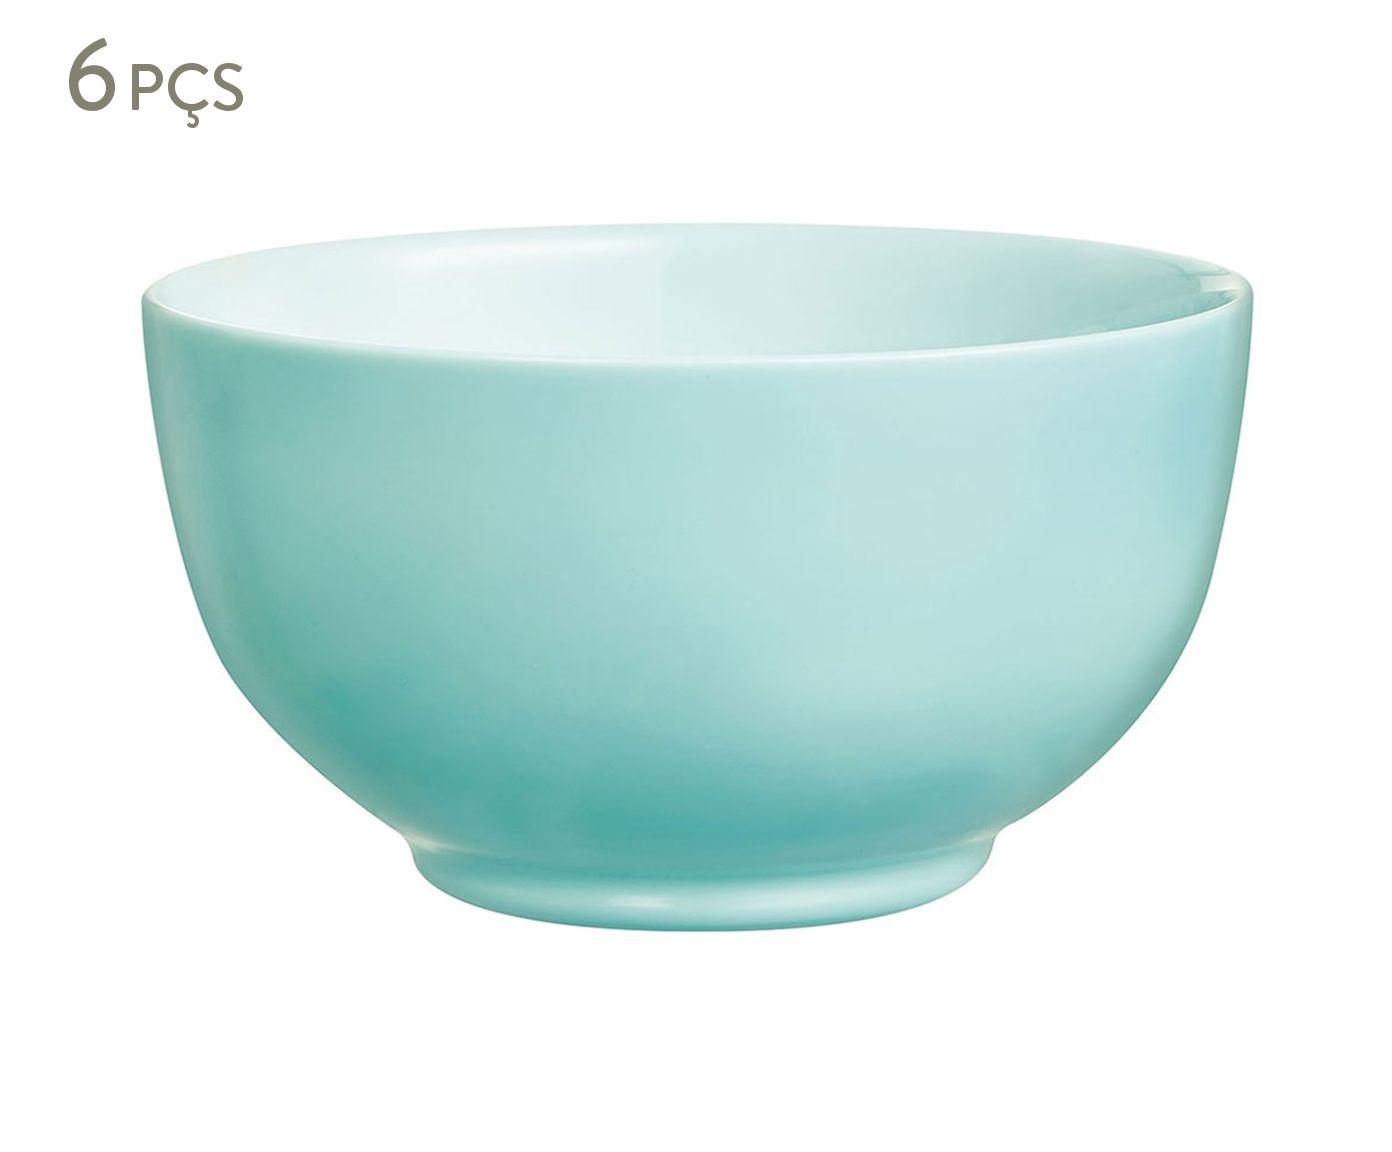 Jogo de Bowls Diwali Turquesa - 14,5cm | Westwing.com.br